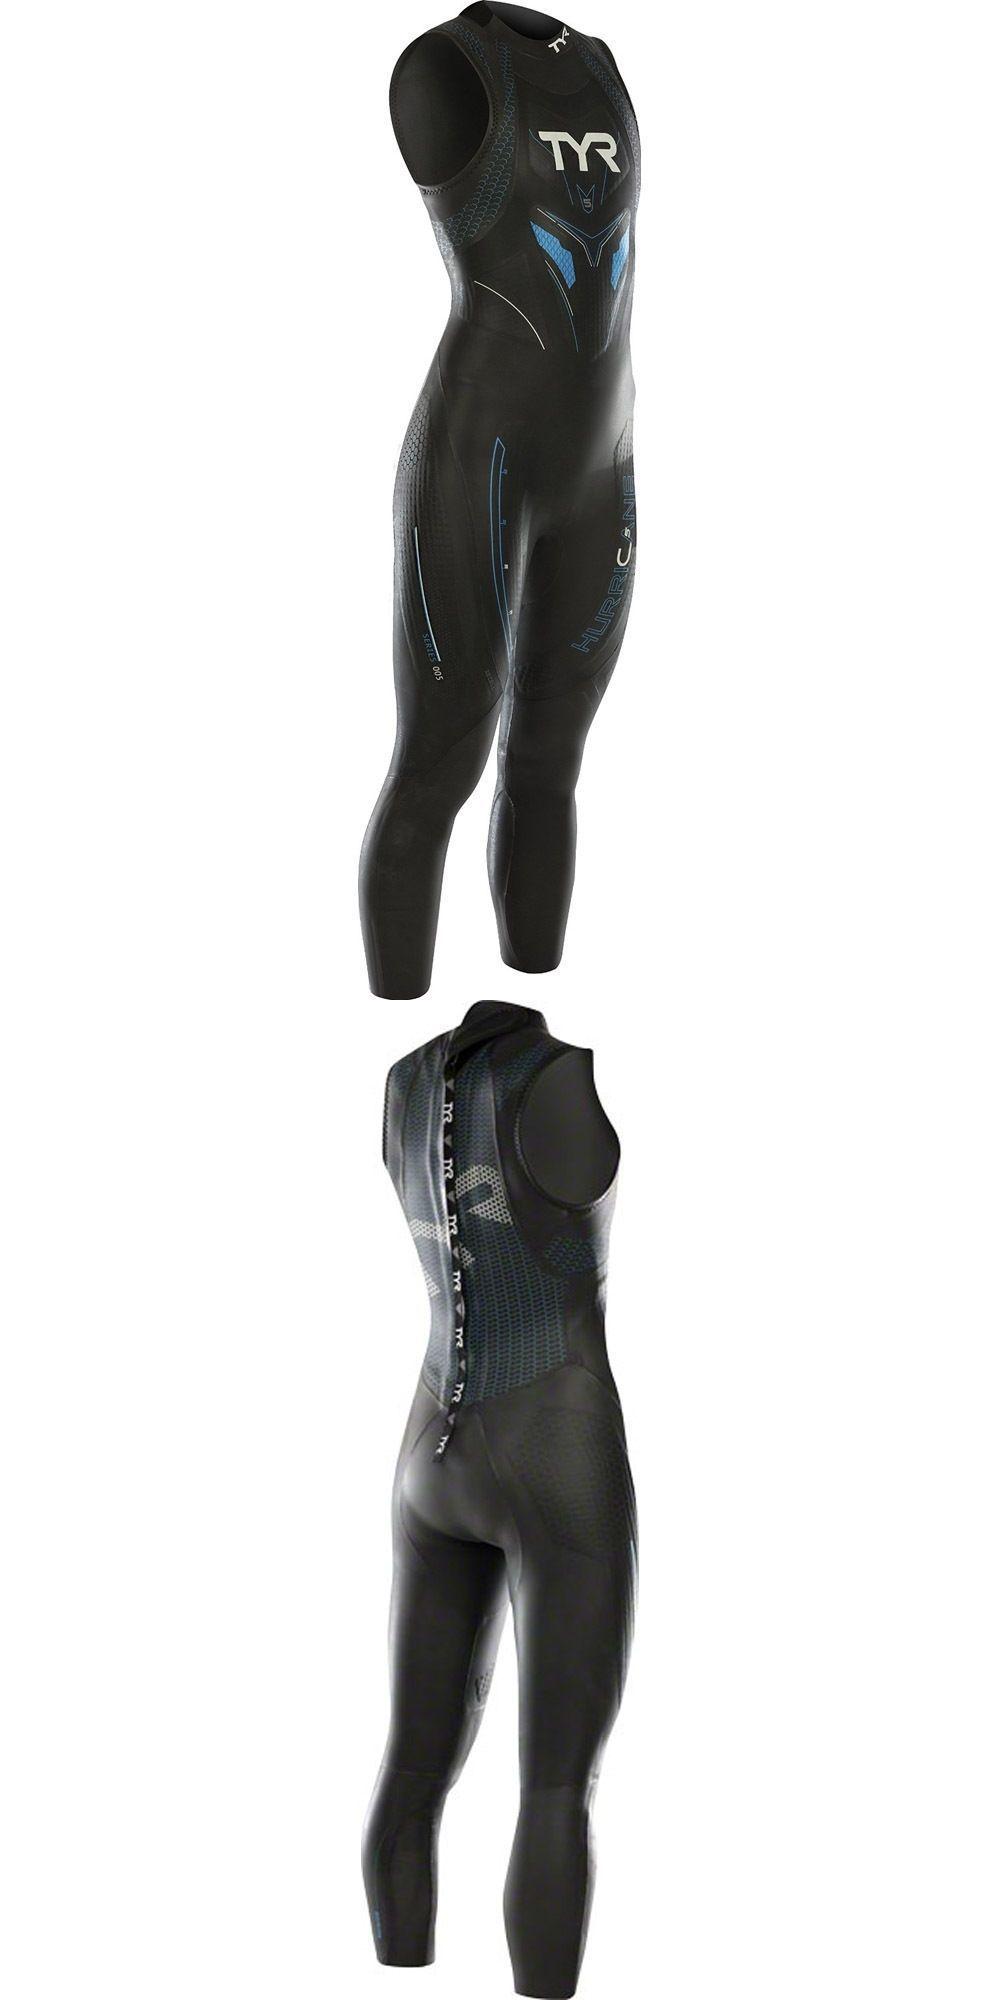 f7dd19e5dcc99 Other Swimming 36269  Tyr Women S Hurricane Cat 5 Sleeveless Wetsuit-Medium  Large-